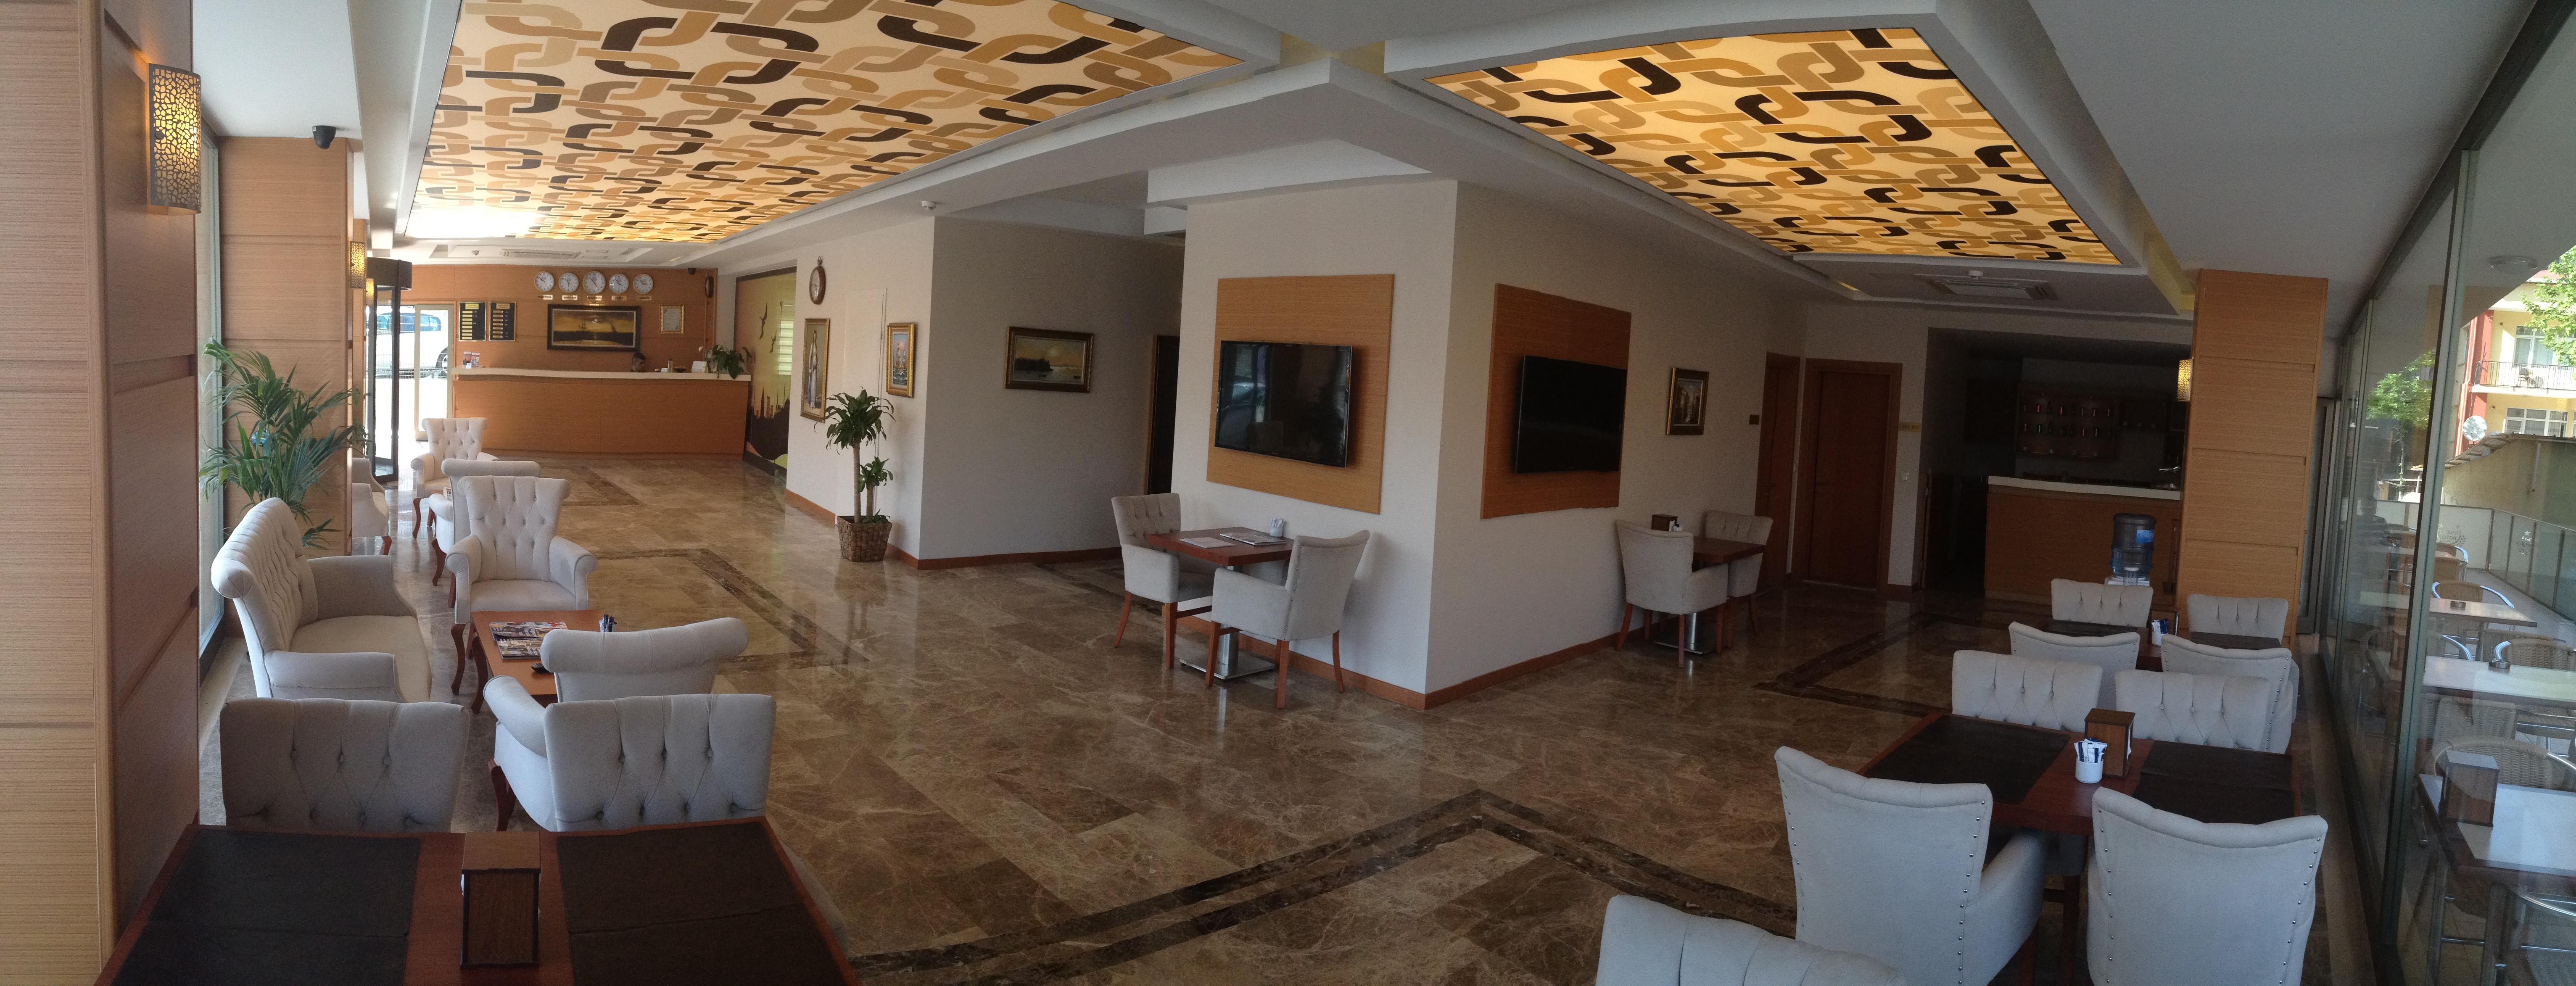 GRAND HOTEL AVCILAR8110